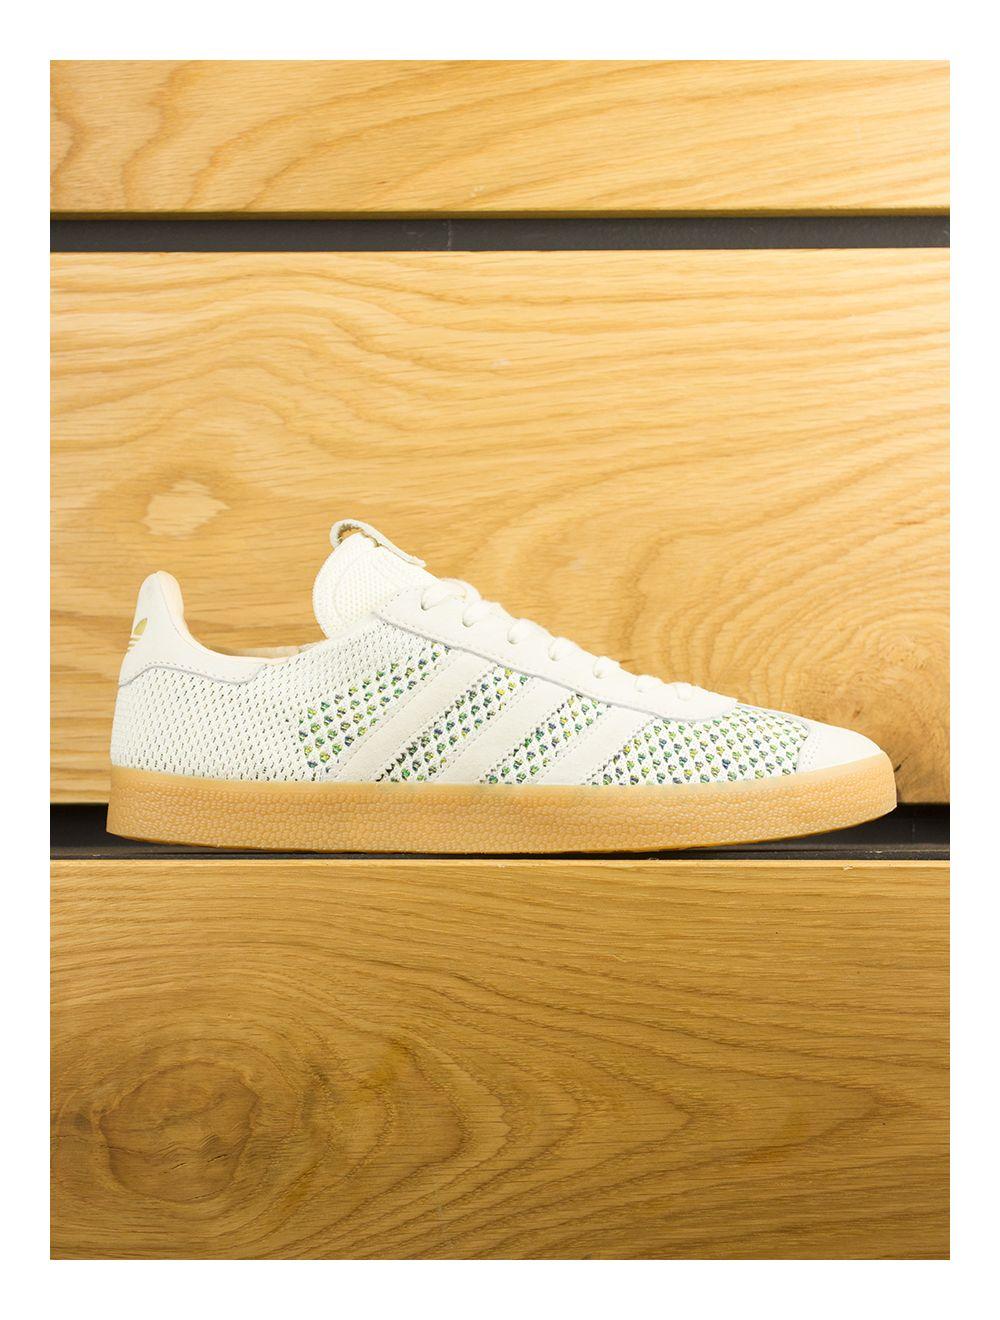 2cb06f90a8d Adidas Consortium Gazelle x Sneaker Politics Prime Knit 'Mardis Gras'